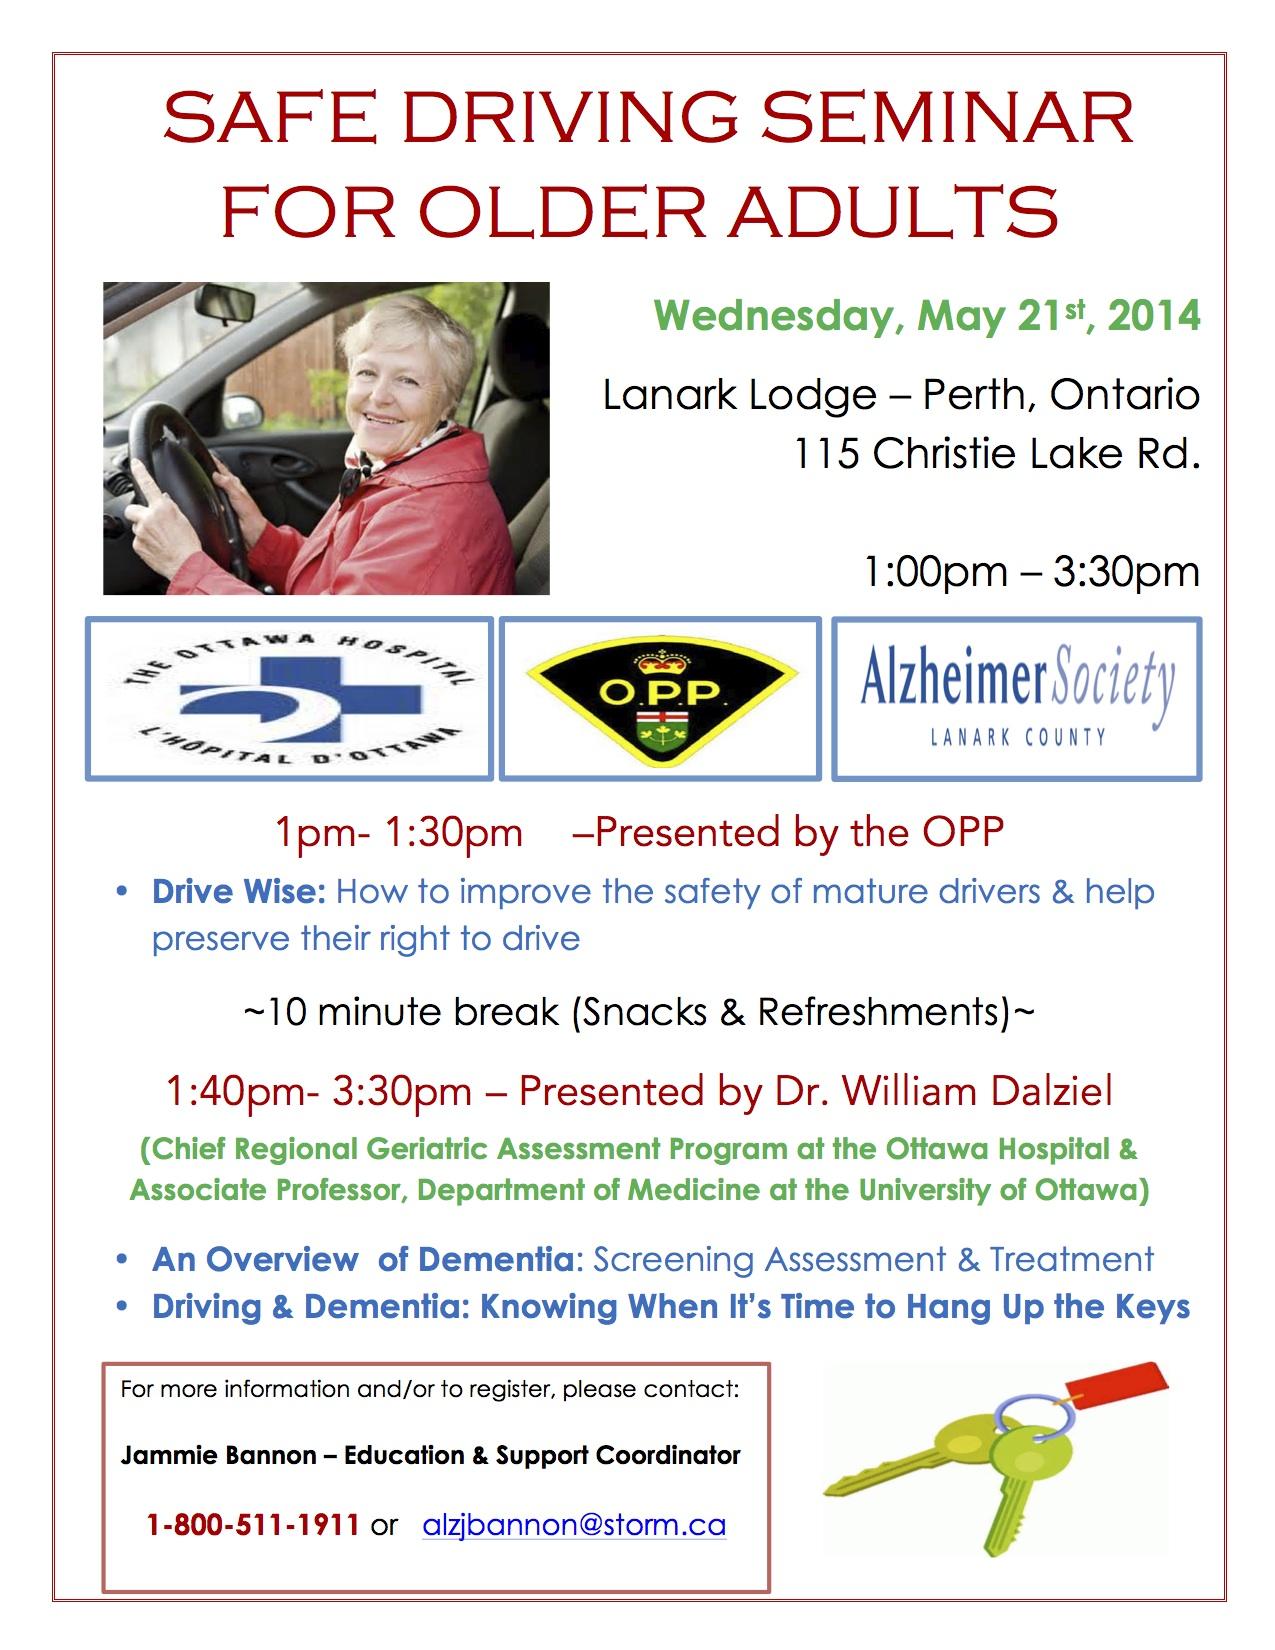 SAFE DRIVING SEMINAR FOR OLDER ADULTS